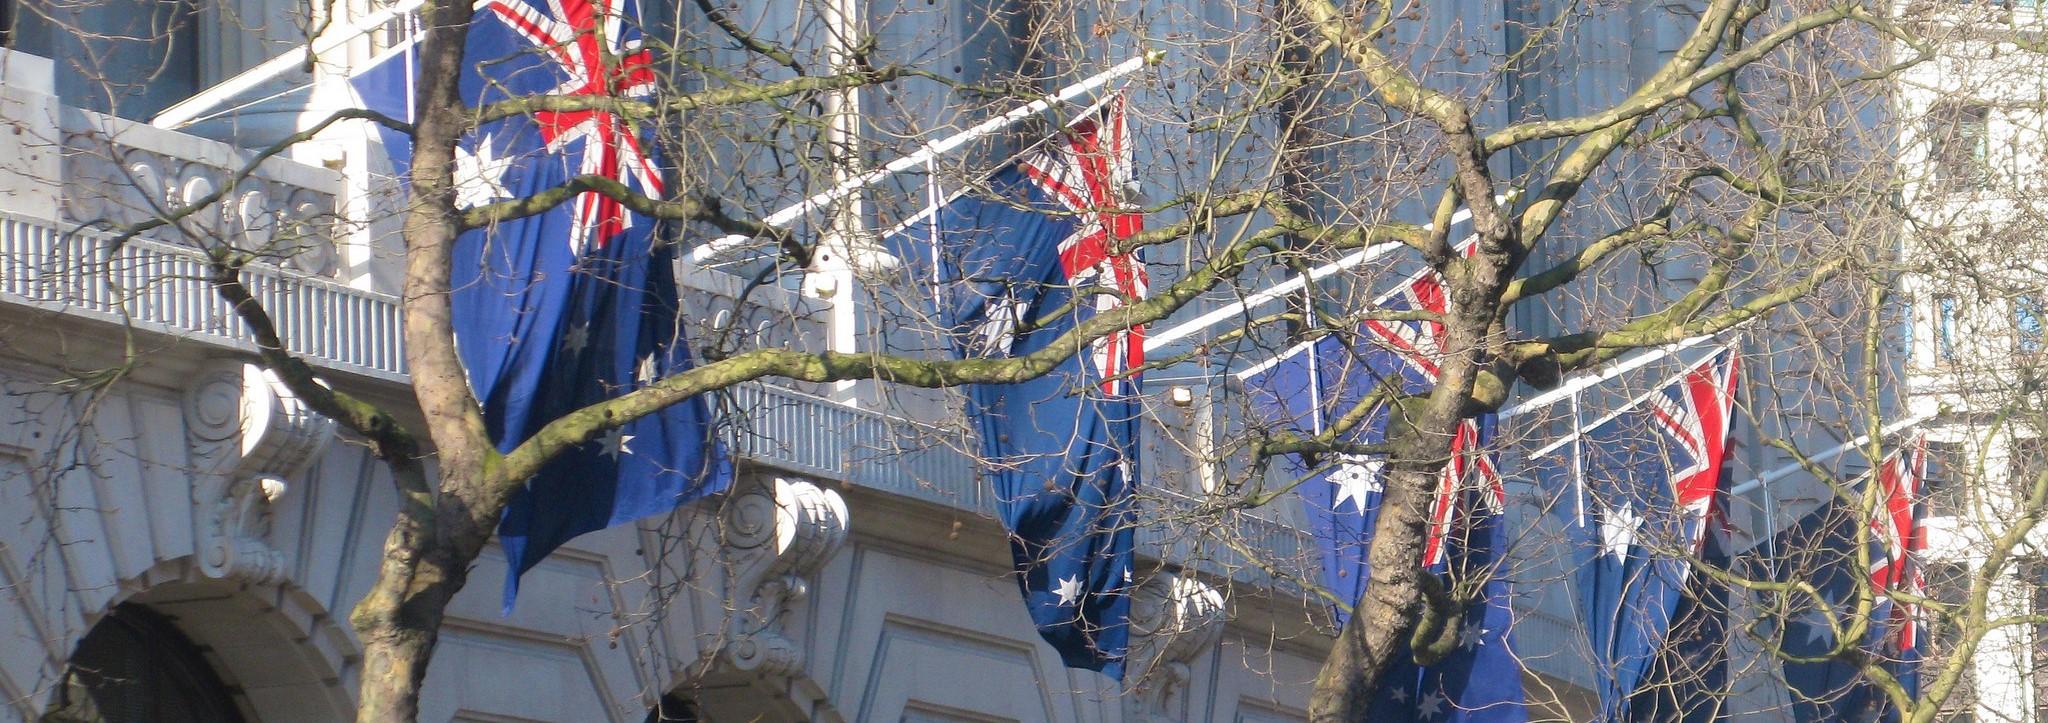 Australia House, London (Photo: Flickr/Ronnie Macdonald)